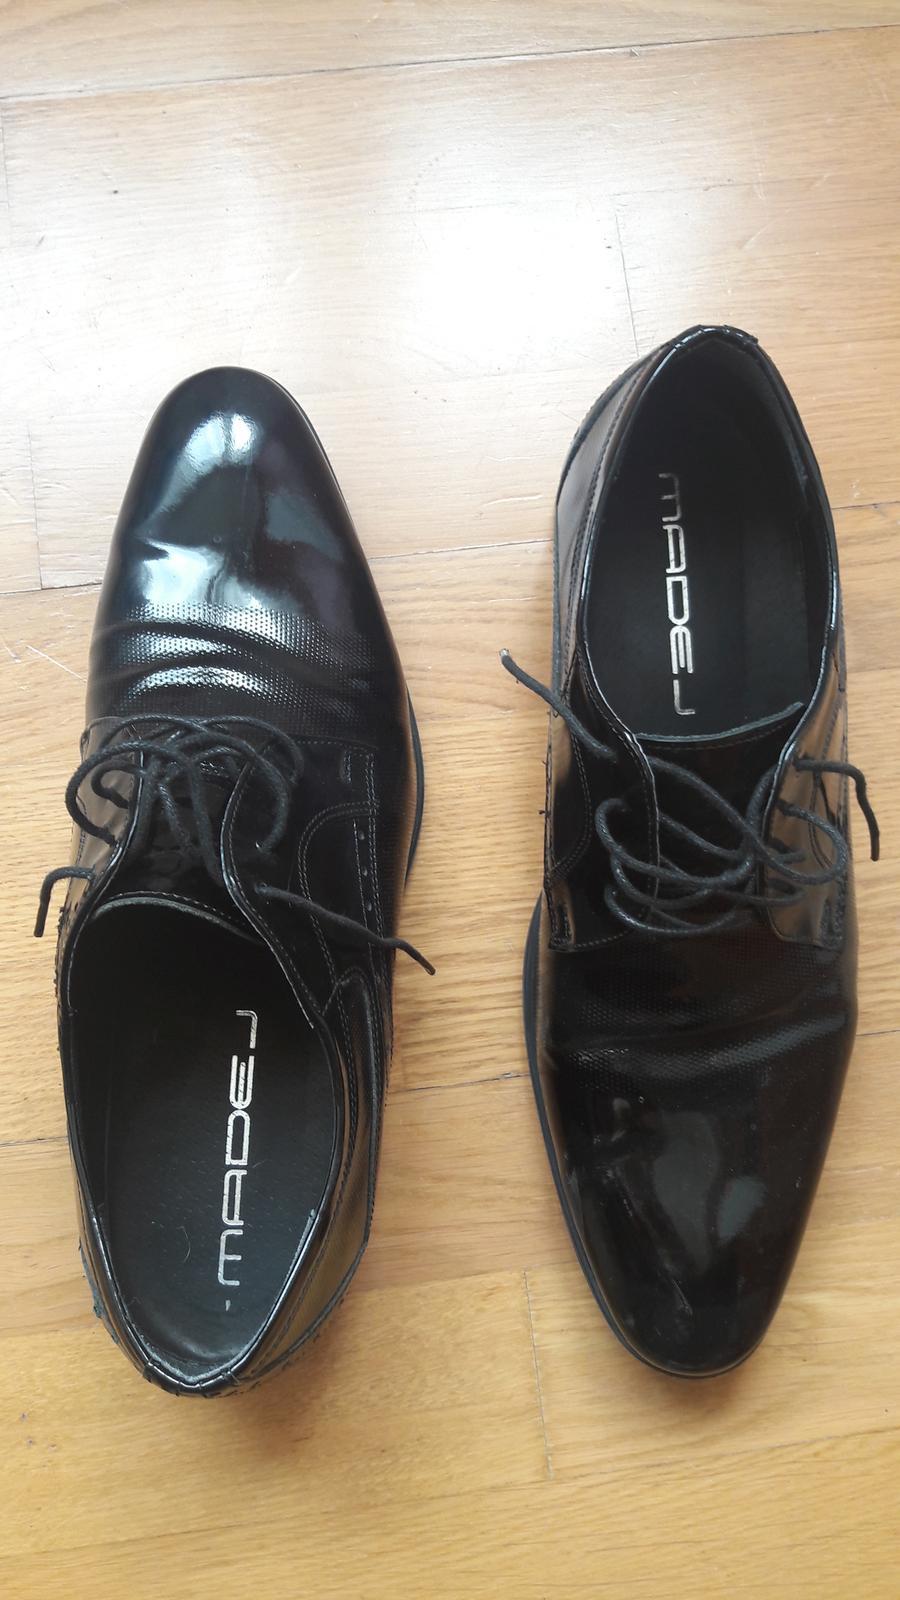 591737c6ed Pánske spoločenské topánky